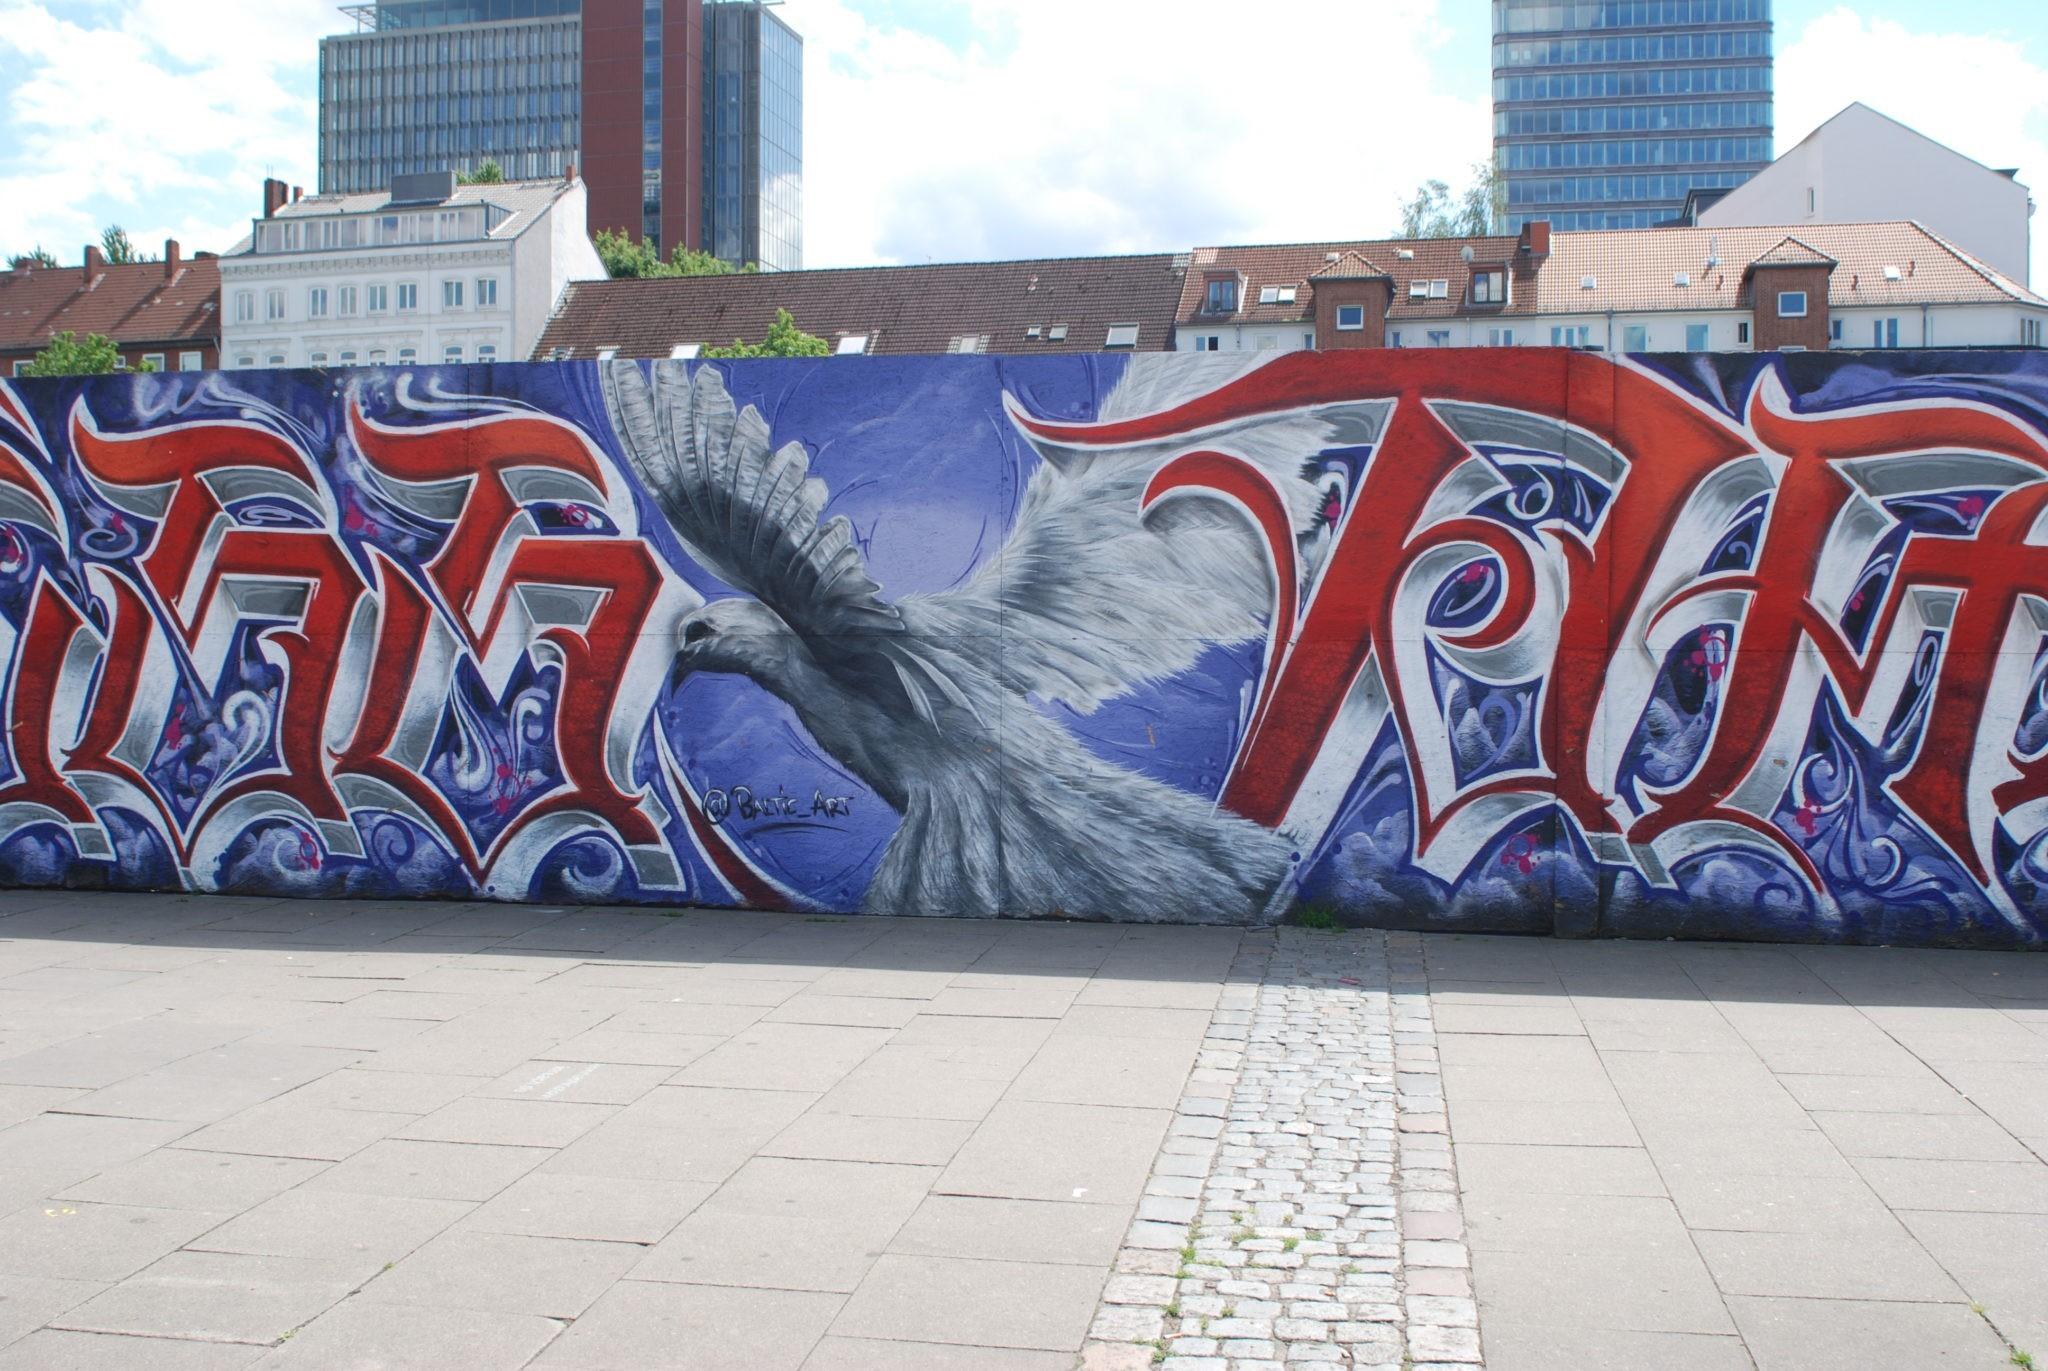 GRAFFITI-SPRAYER: VOM KAVALIERSDELIKT ZUM BERUF